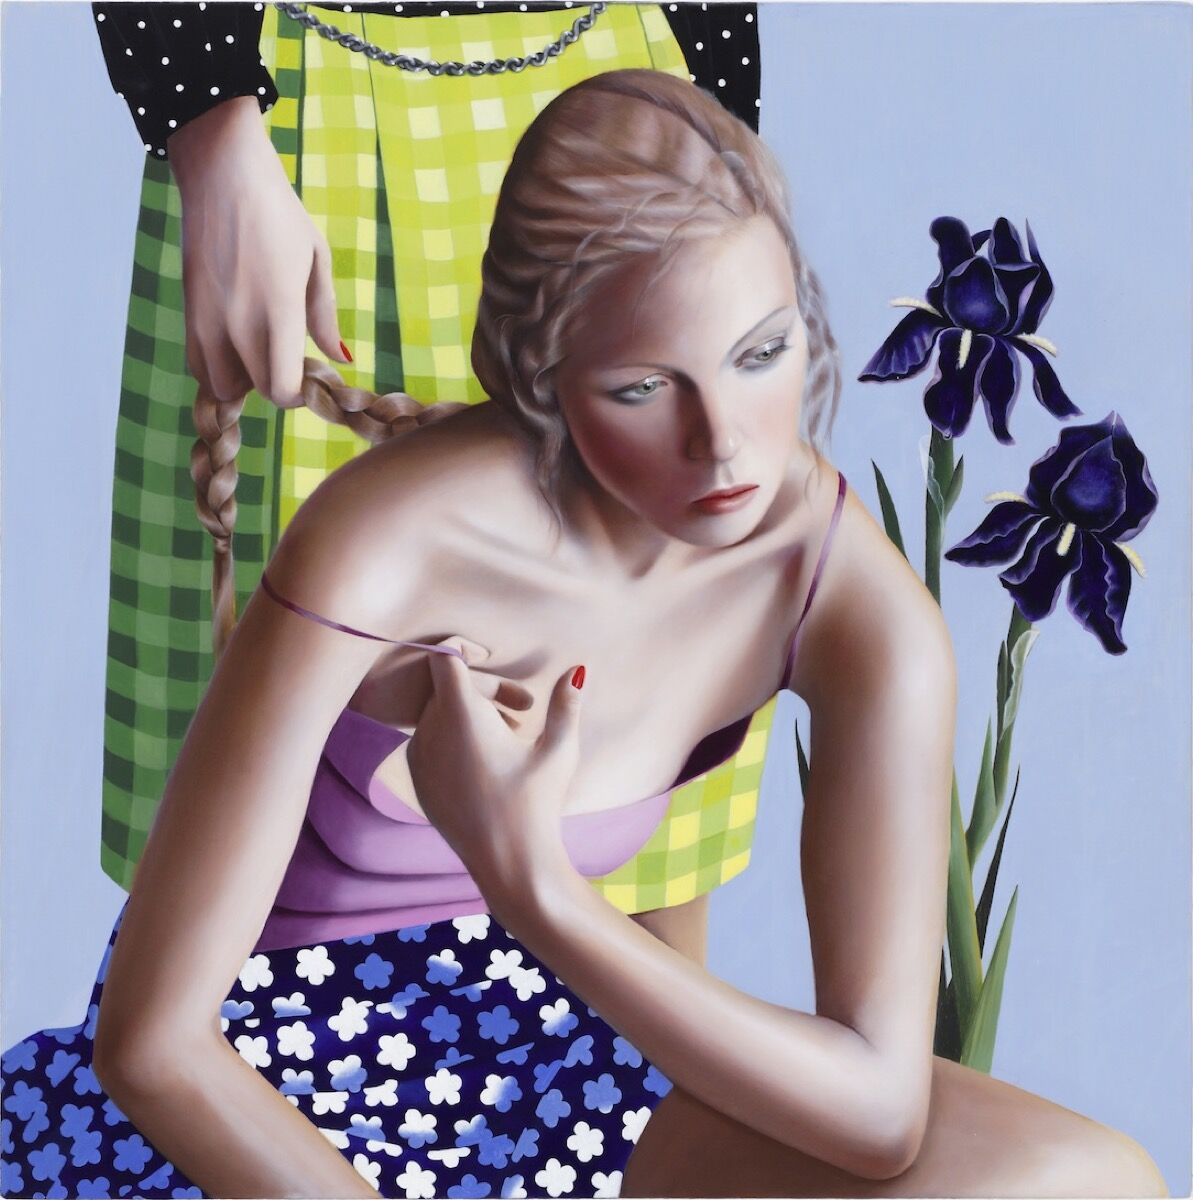 Jocelyn Hobbie, Twin Iris, 2012. © Jocelyn Hobbie. Courtesy of Fredericks & Freiser, NY.